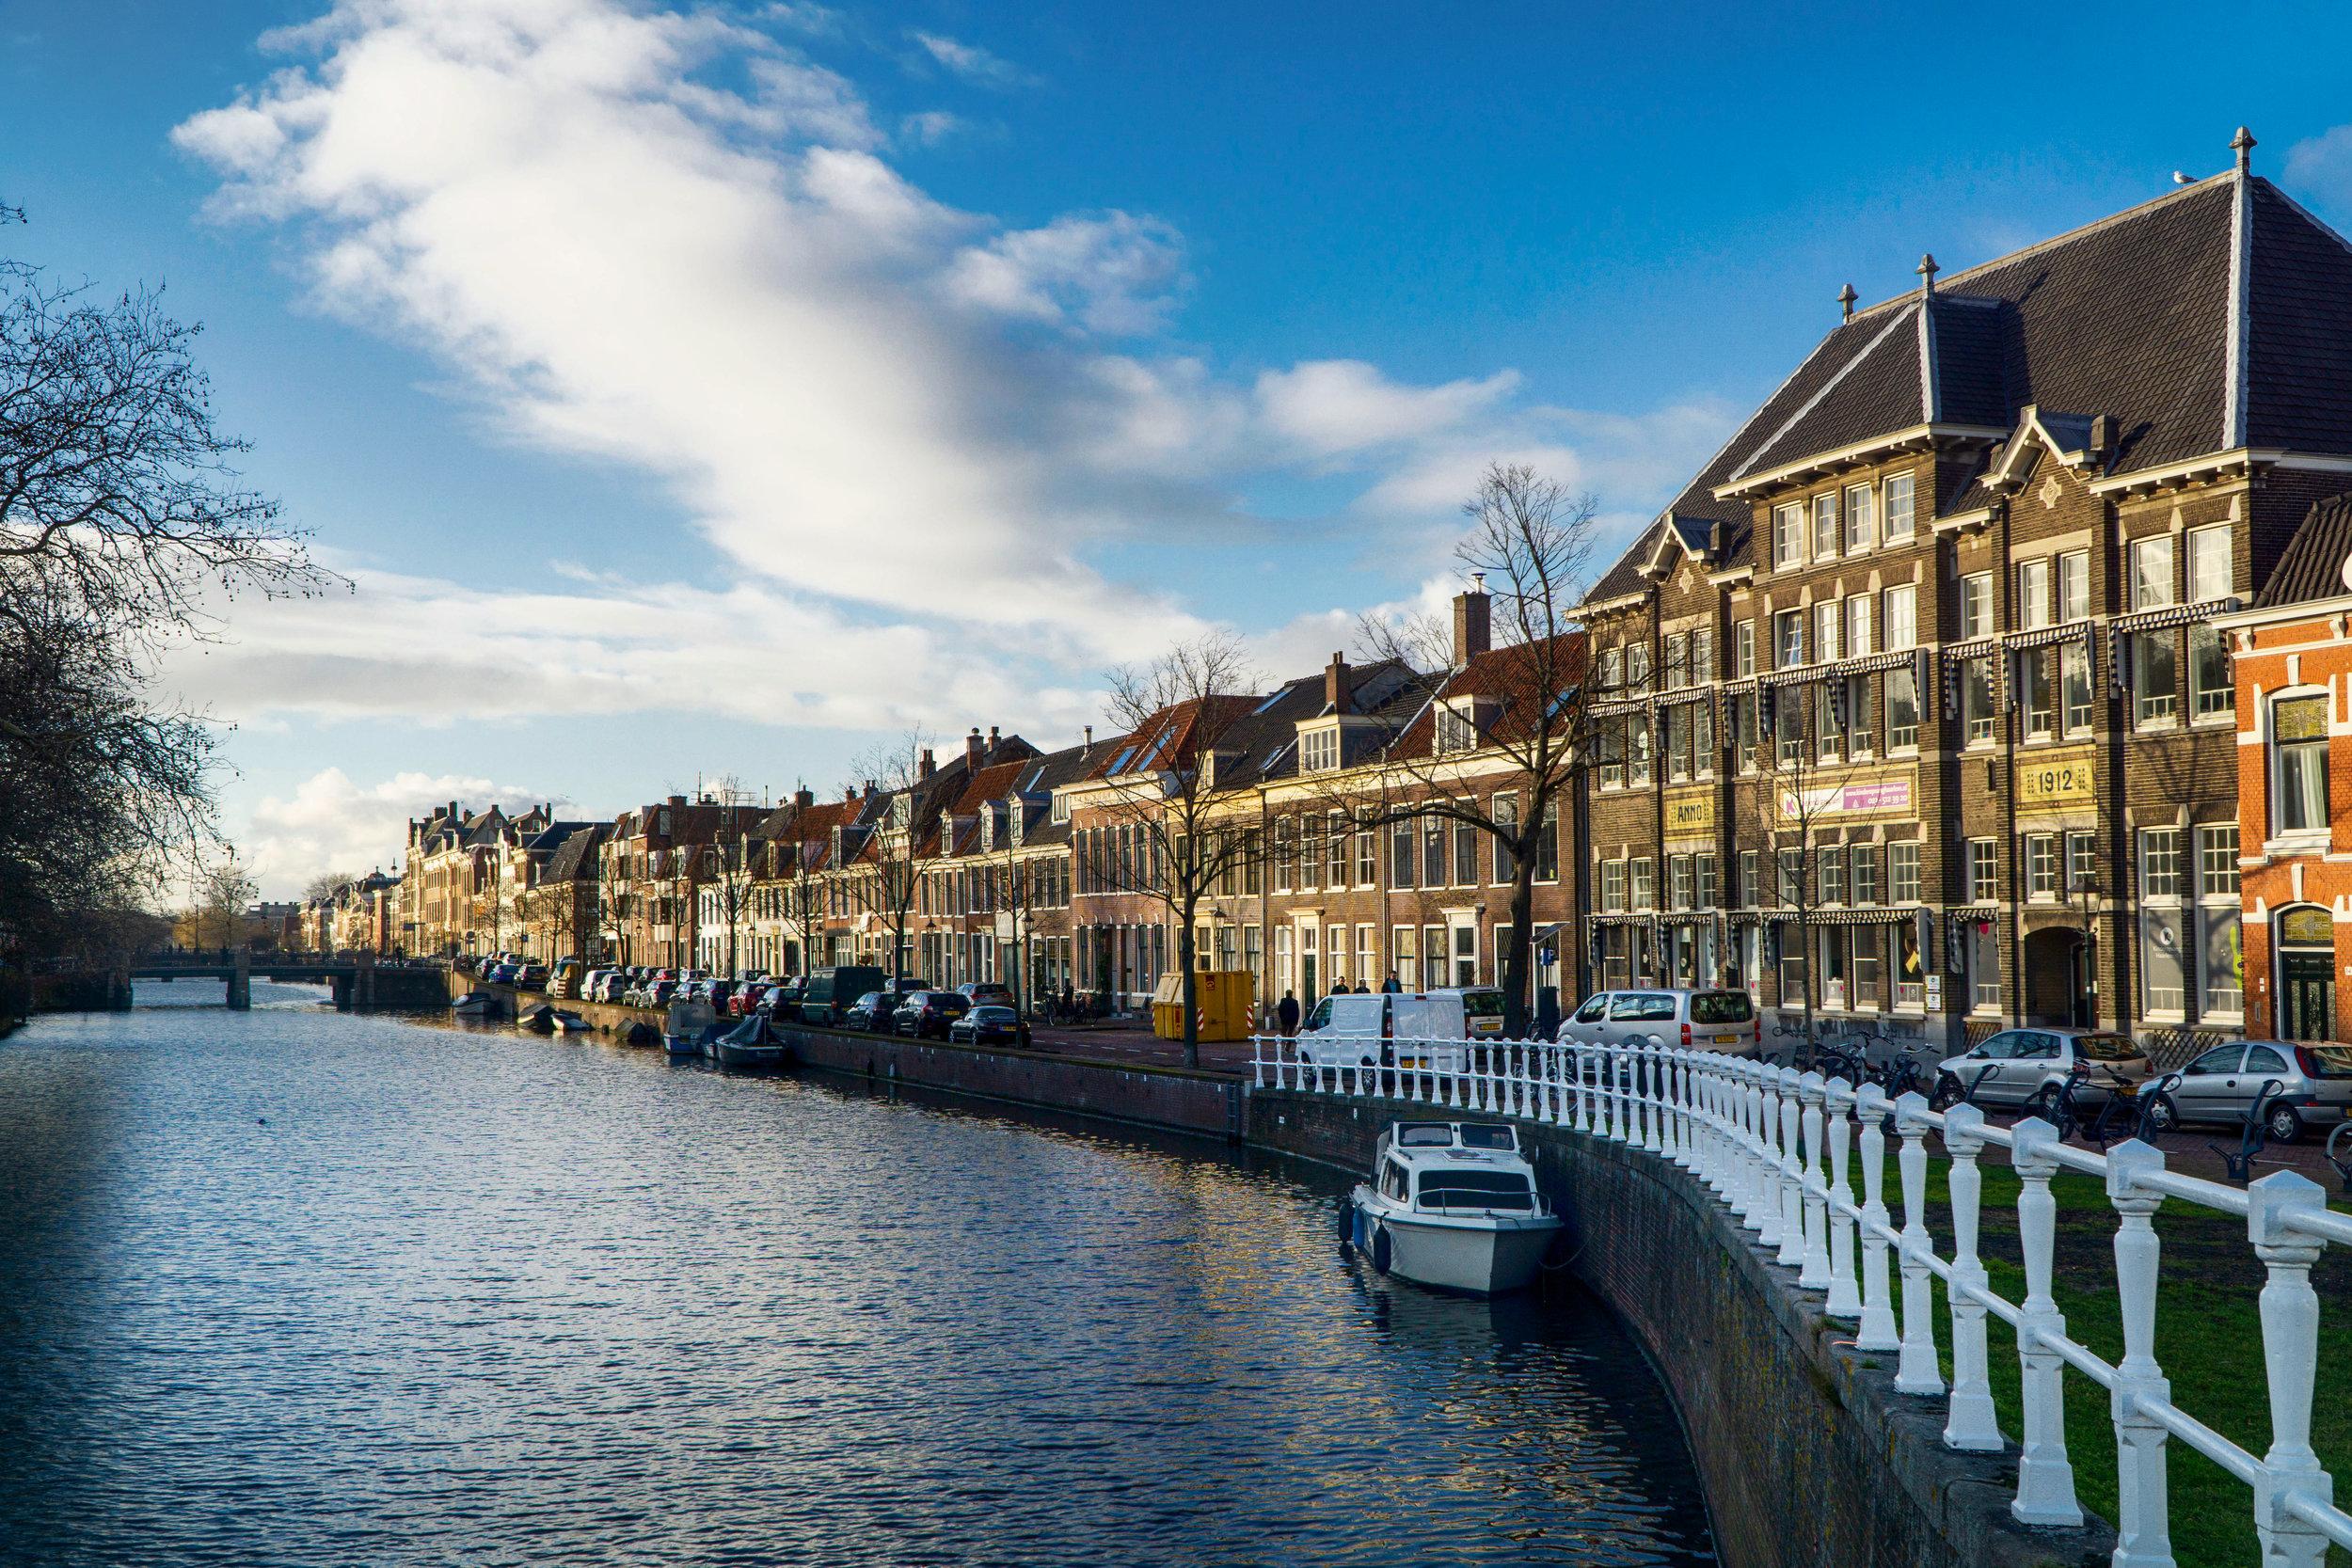 Holland_theNetherlands_vickygood_travel_photography2_sm.jpg